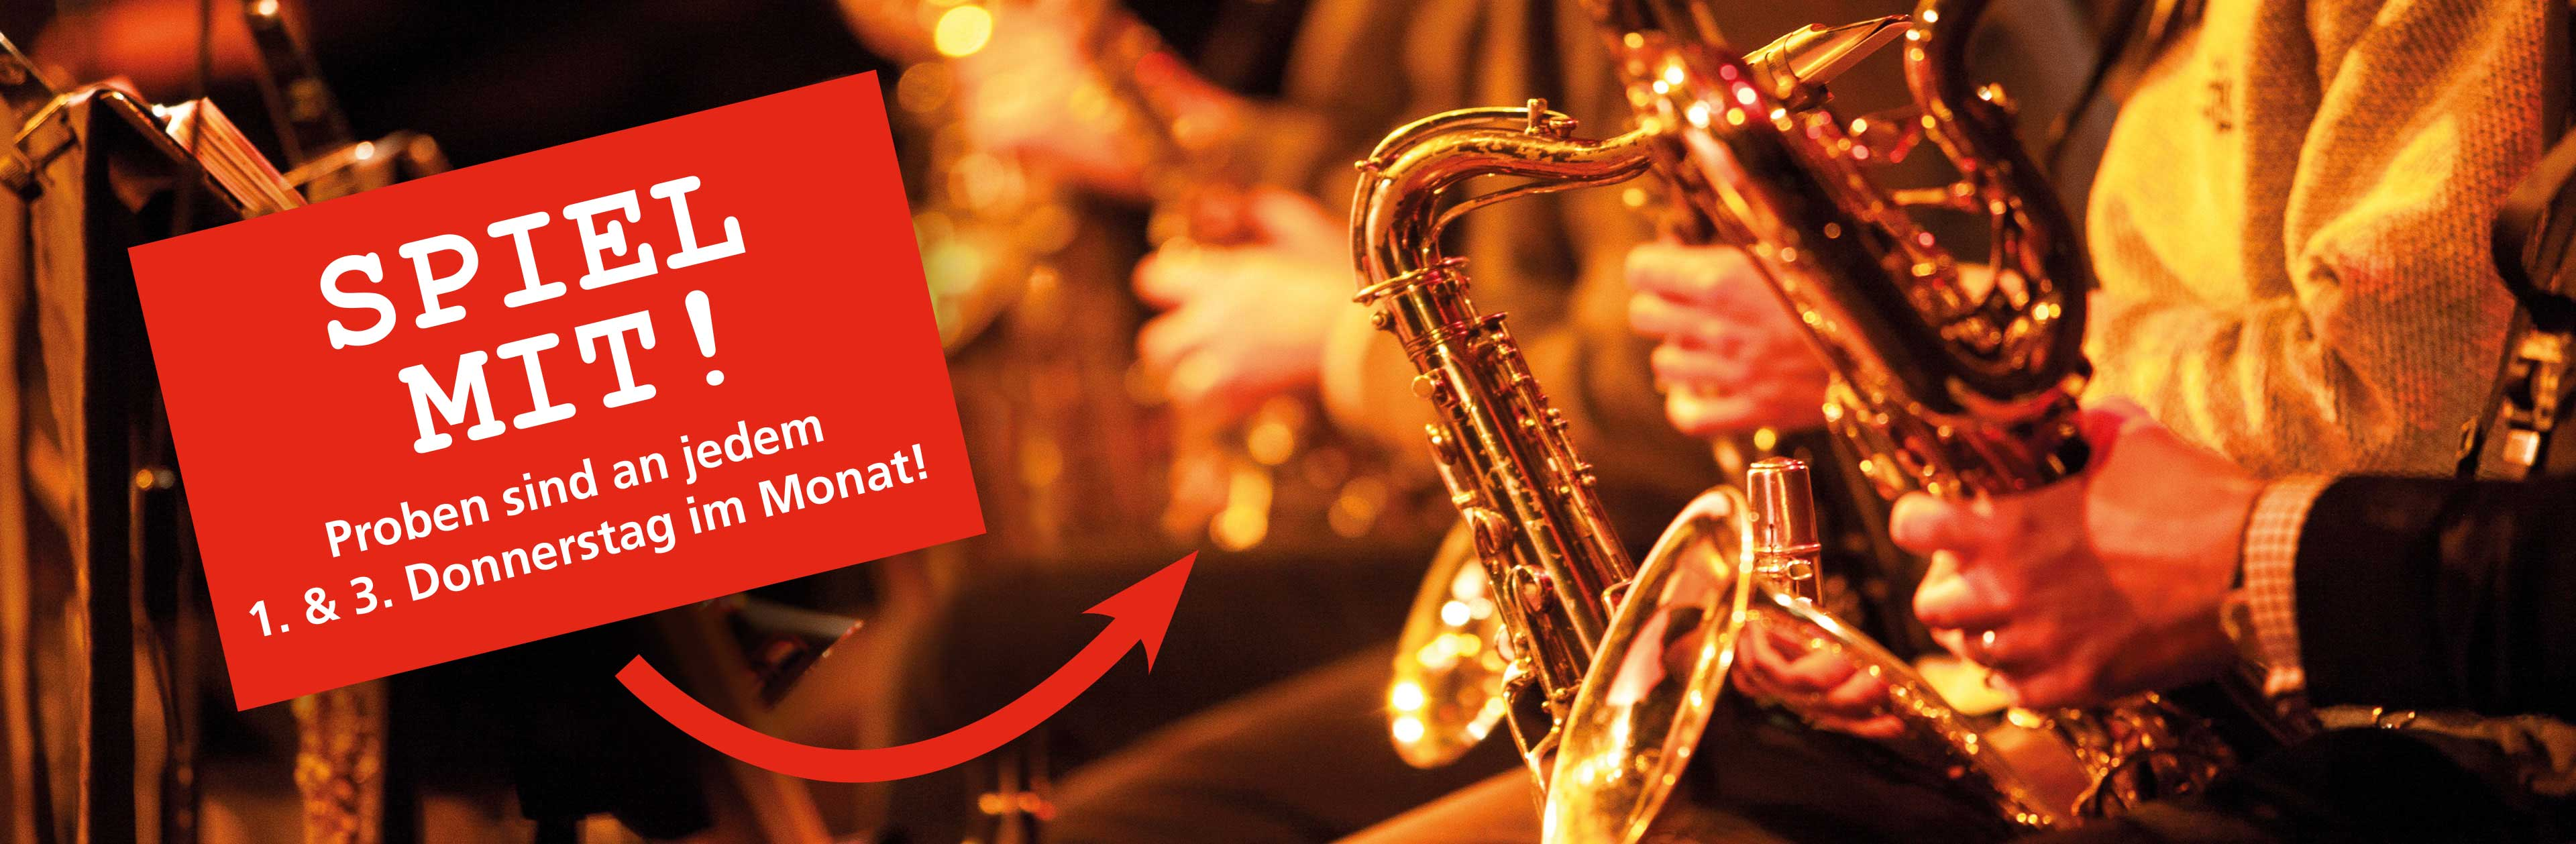 saxophone-kaufen-in-hamburgApNpDXYbWaeWN